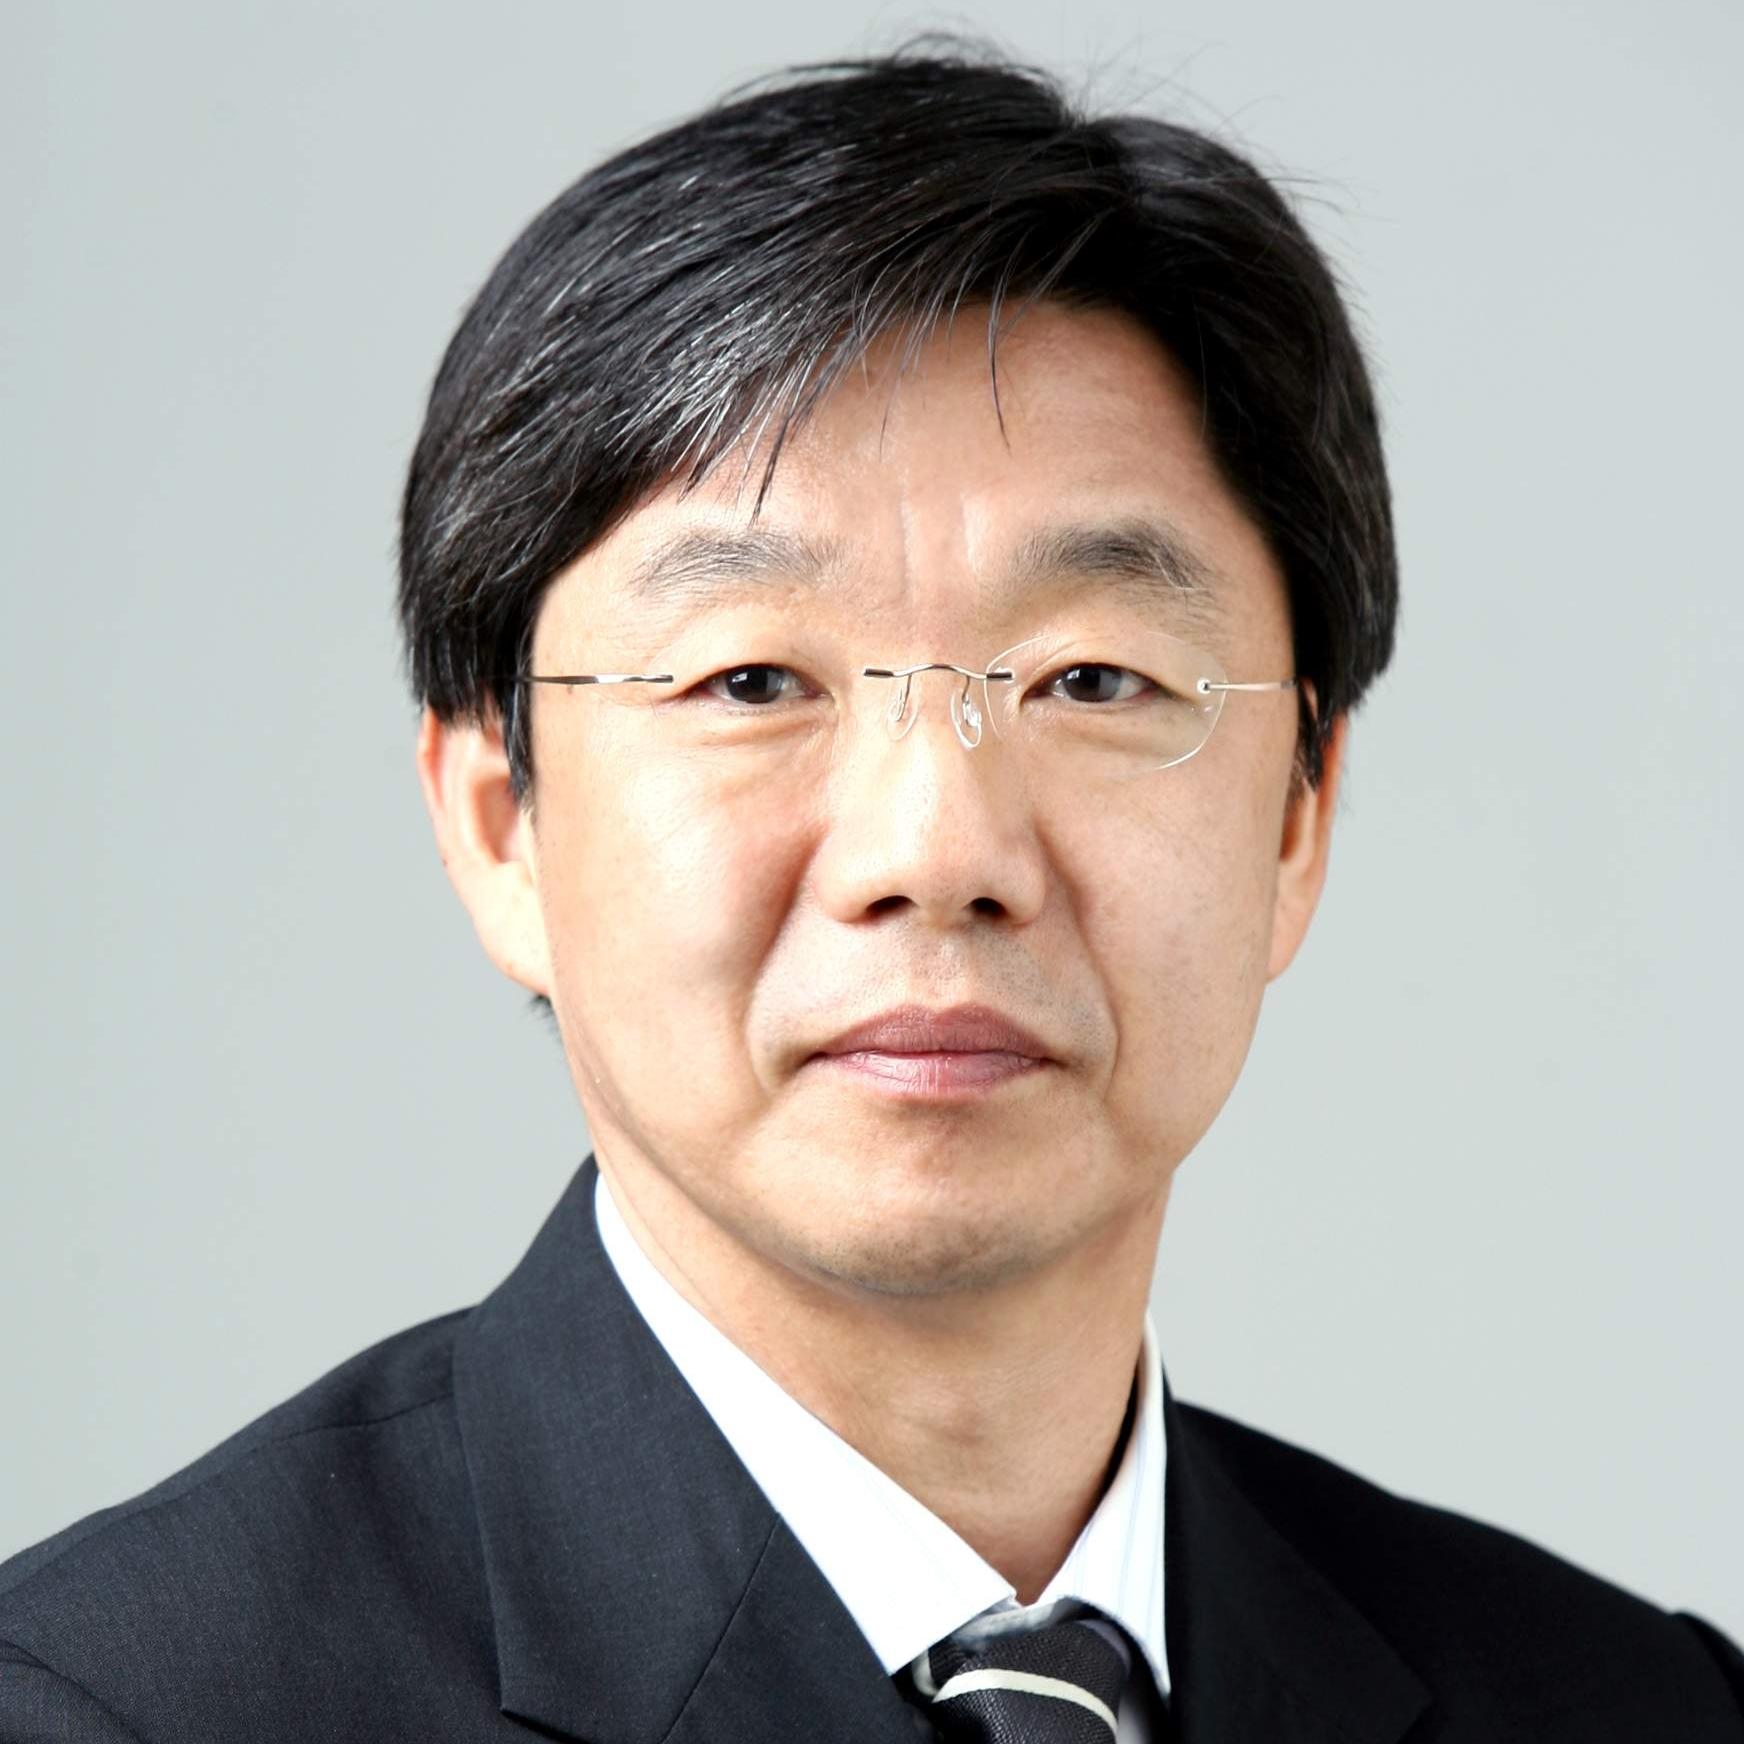 Joosung Jun - Professor of Economics, Ewha Womans University, South Korea